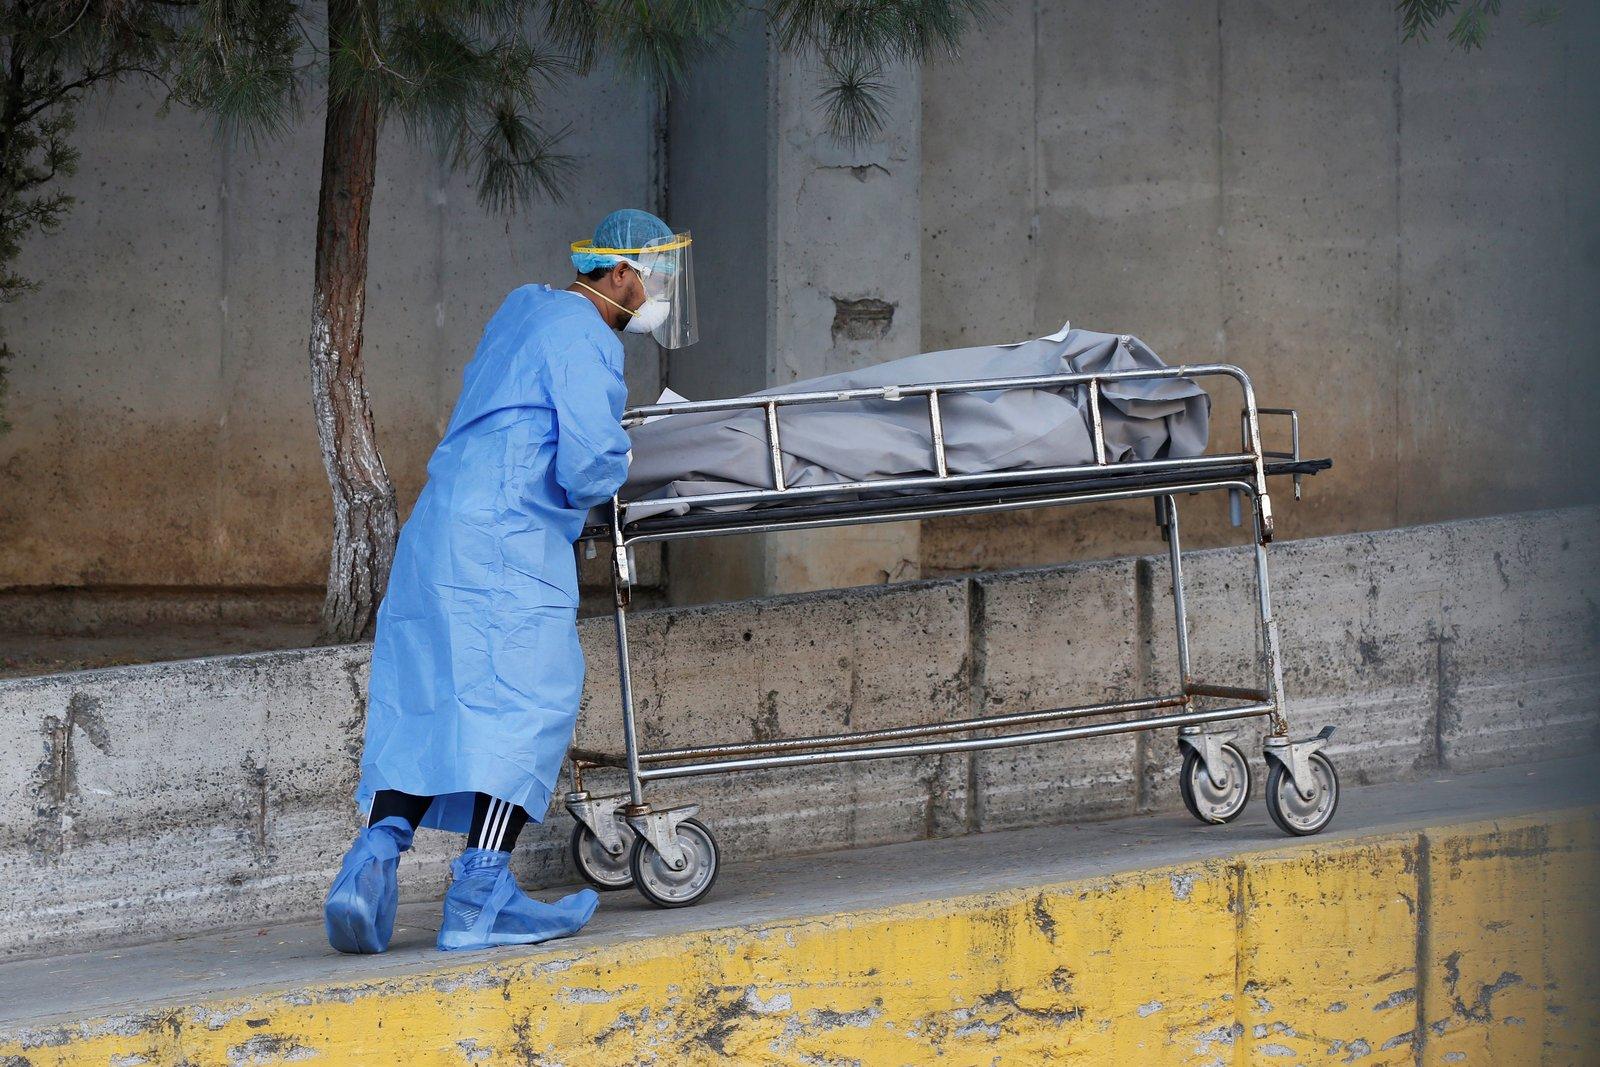 México registra 159 mil 100 muertes por COVID-19